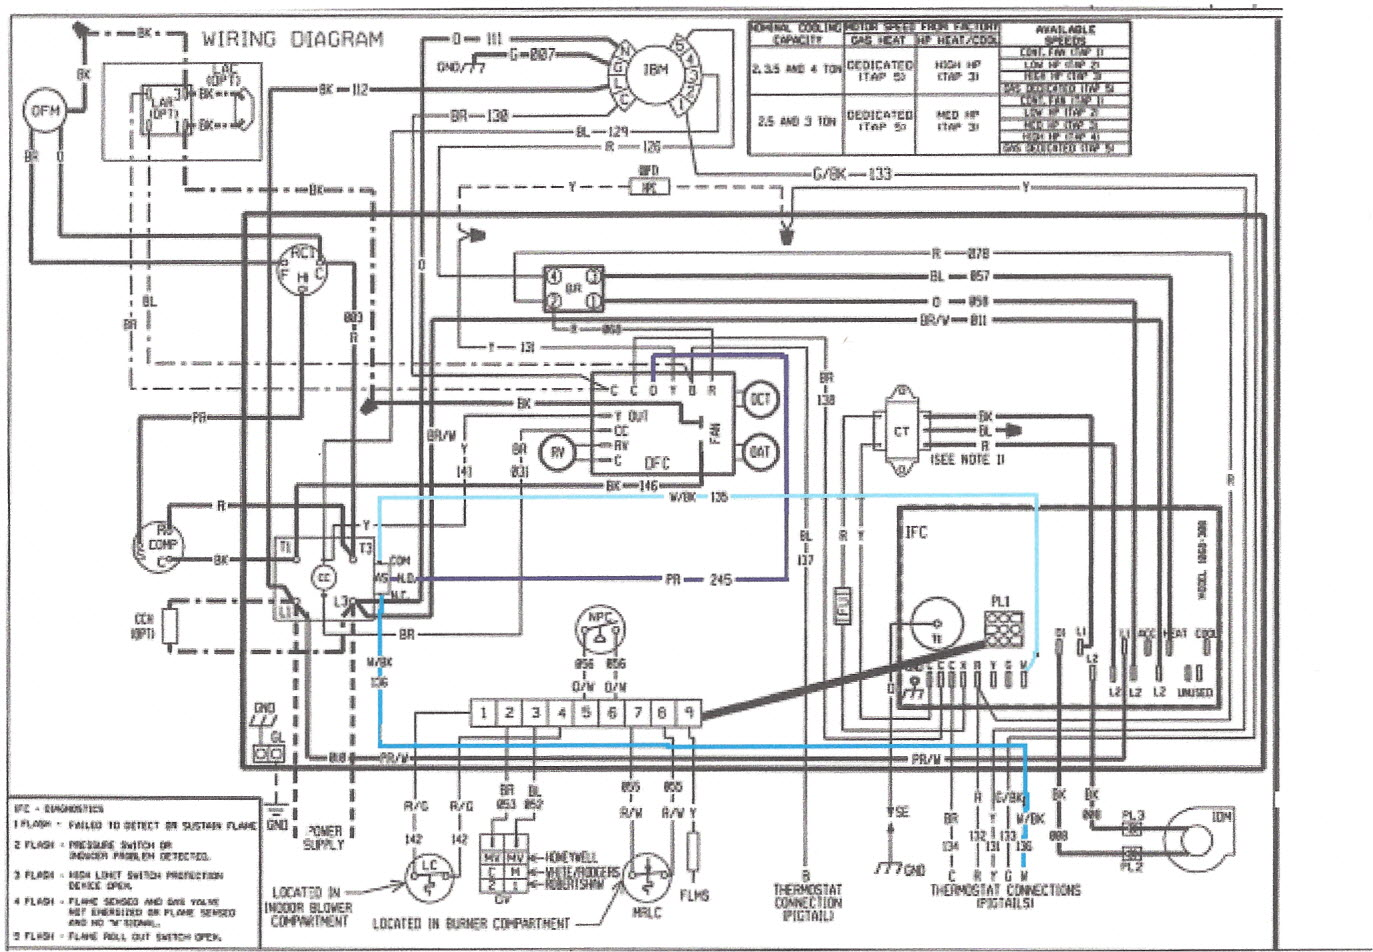 [DIAGRAM_38IU]  AO_9818] Furnace Wiring Diagram Together With Tempstar Heat Pump Wiring  Diagram Schematic Wiring | Rheem Wiring Schematic |  | Boapu Pendu Inkl Nerve Cette Mohammedshrine Librar Wiring 101